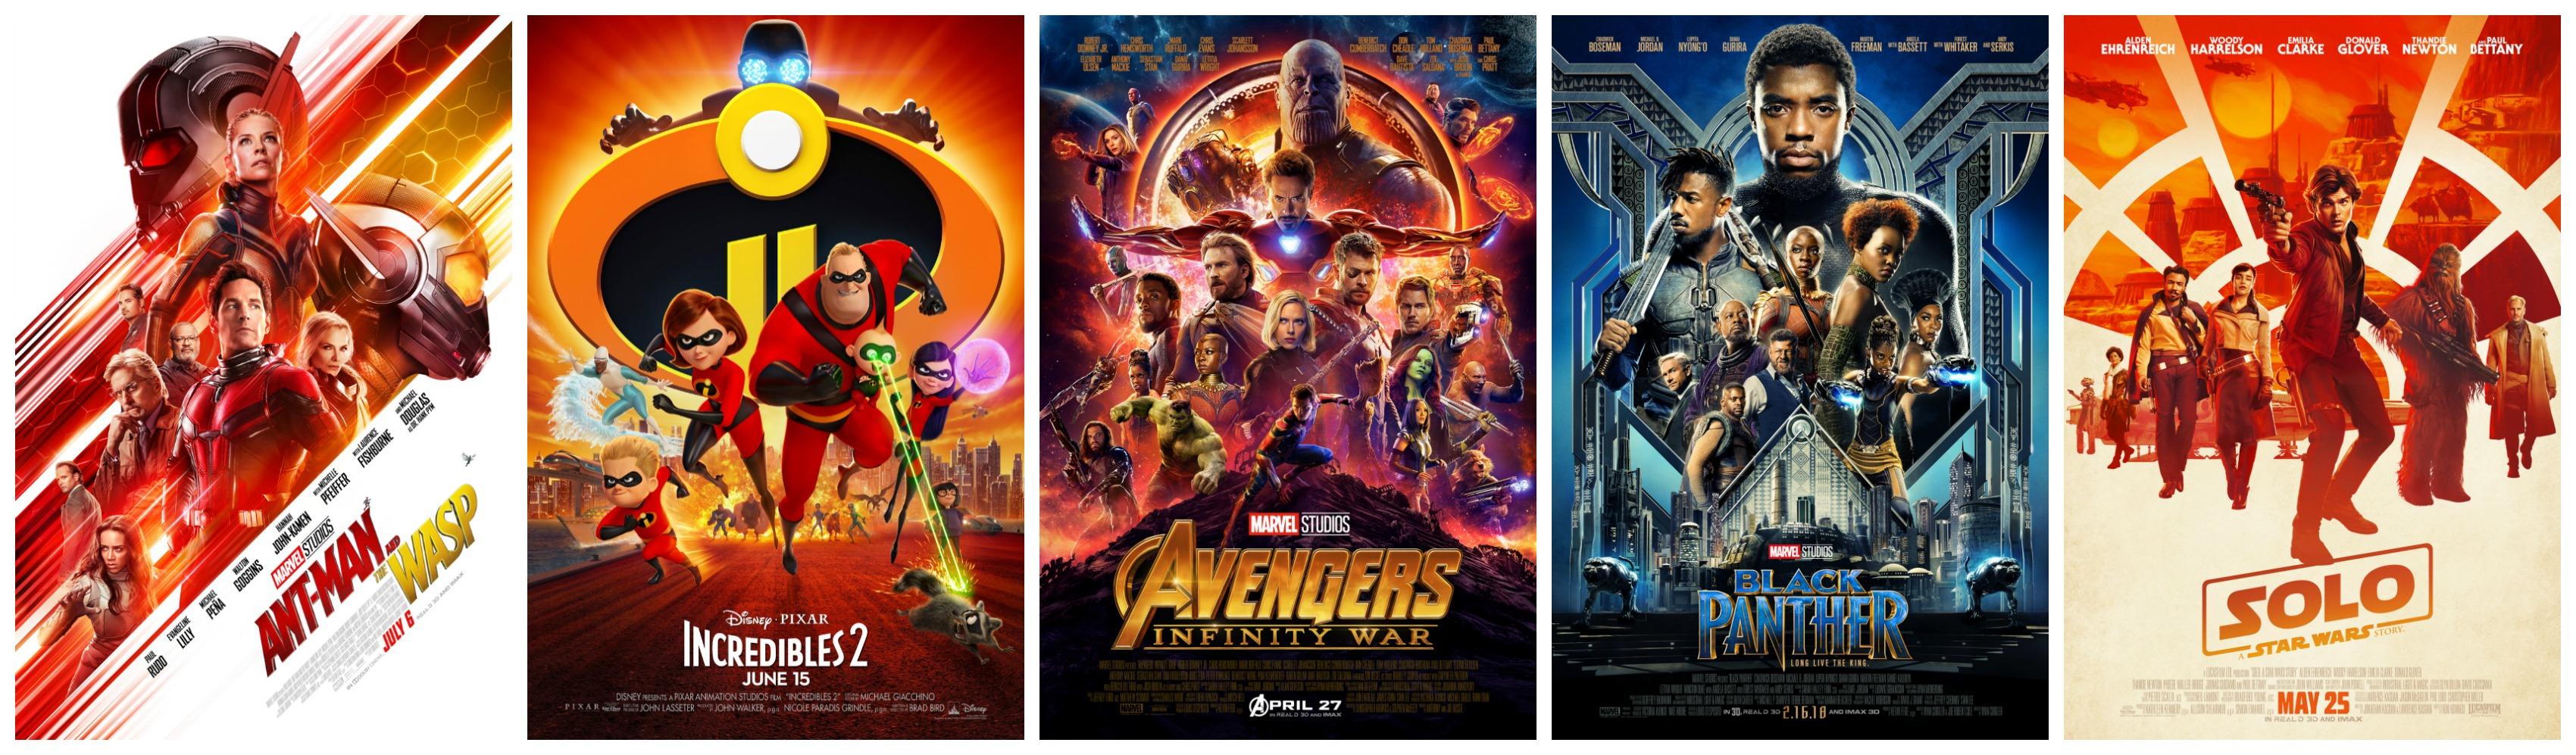 Top 5 Disney Company Films of 2018 / Top 5 Predictions of 2019